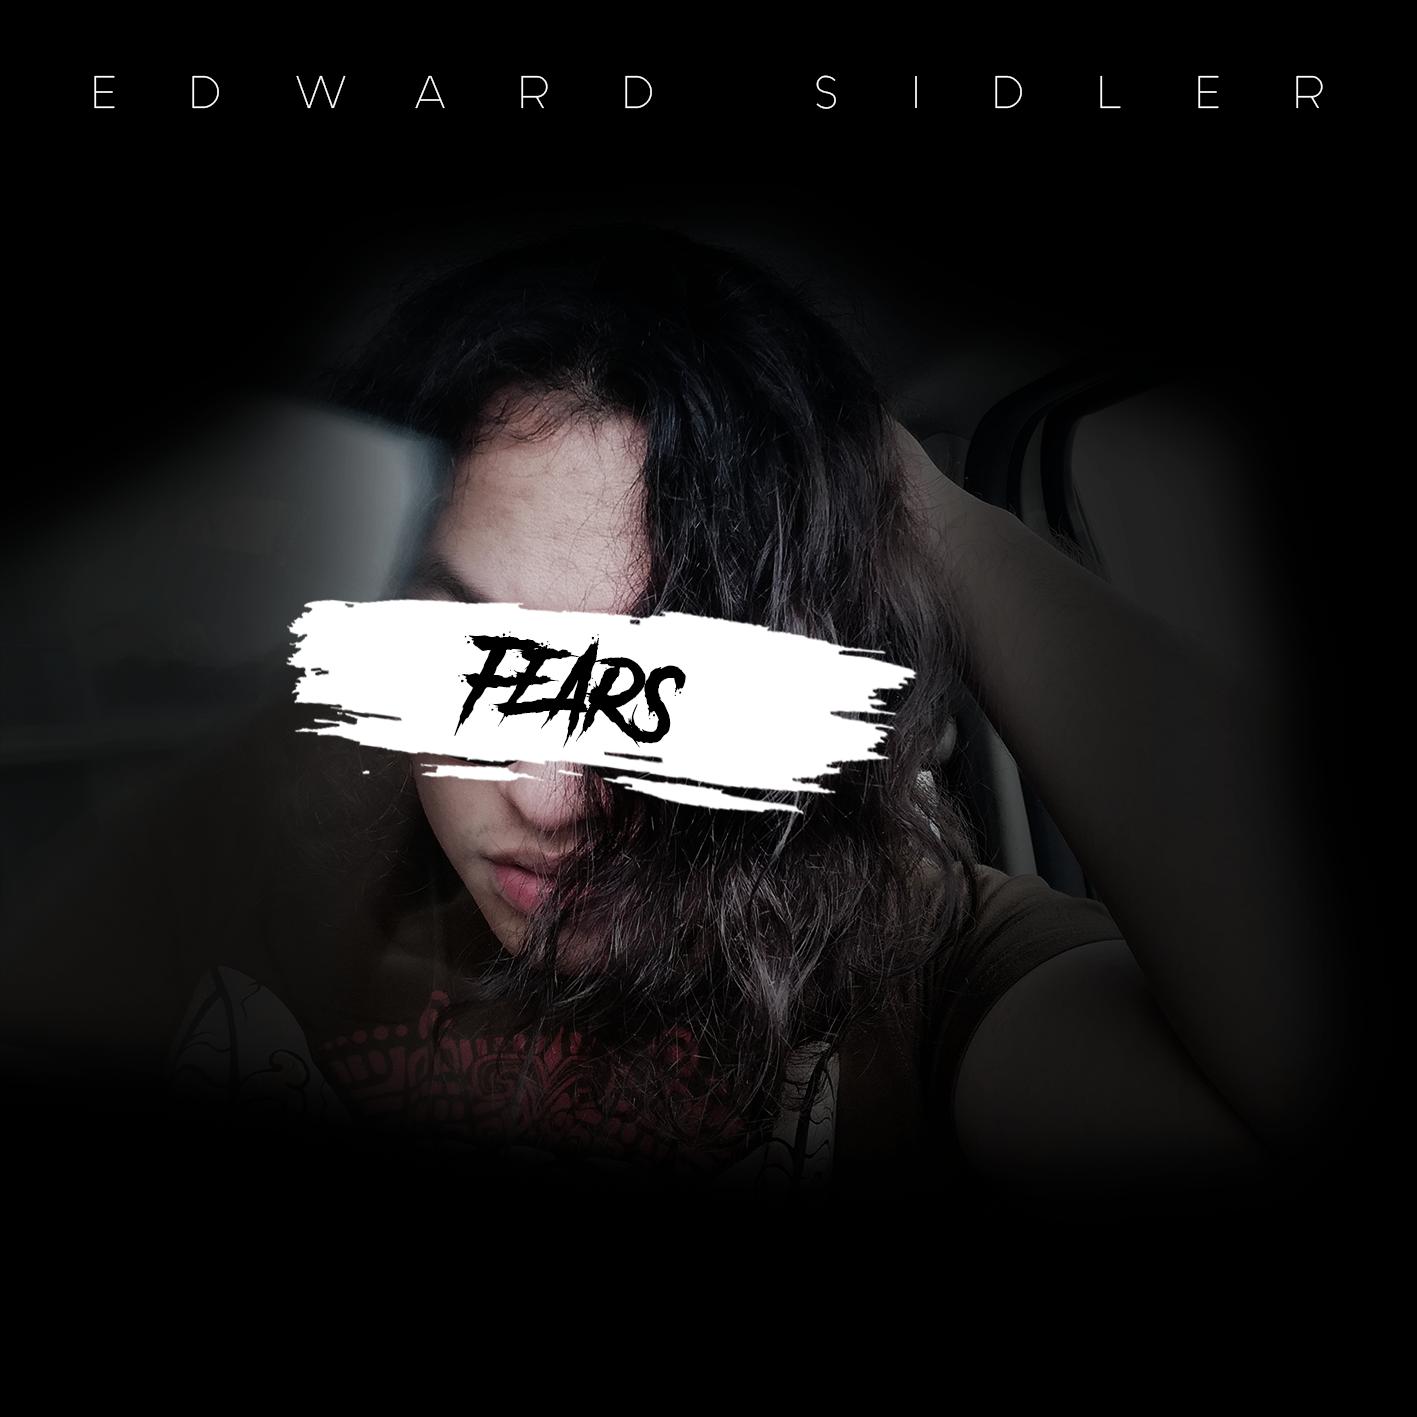 edward-sidler-fears.png